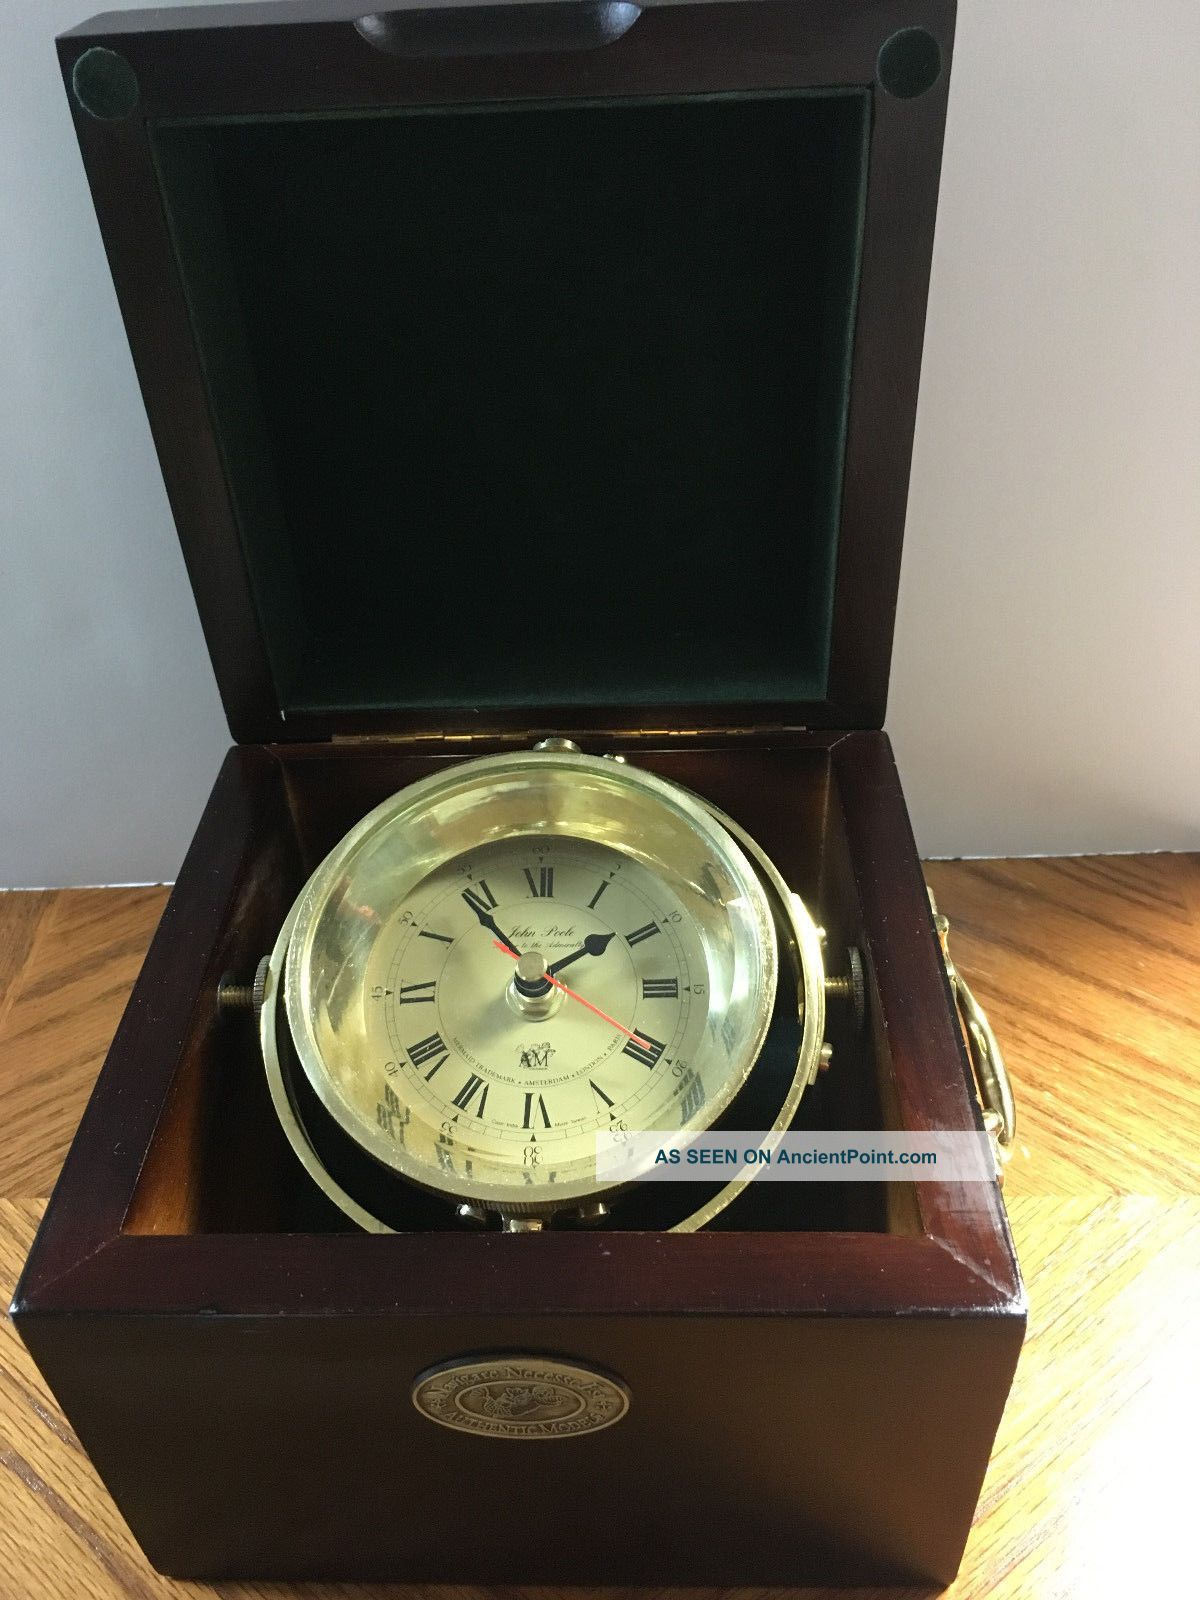 Vintage John Poole London Marine Chronometer Clock Clocks photo